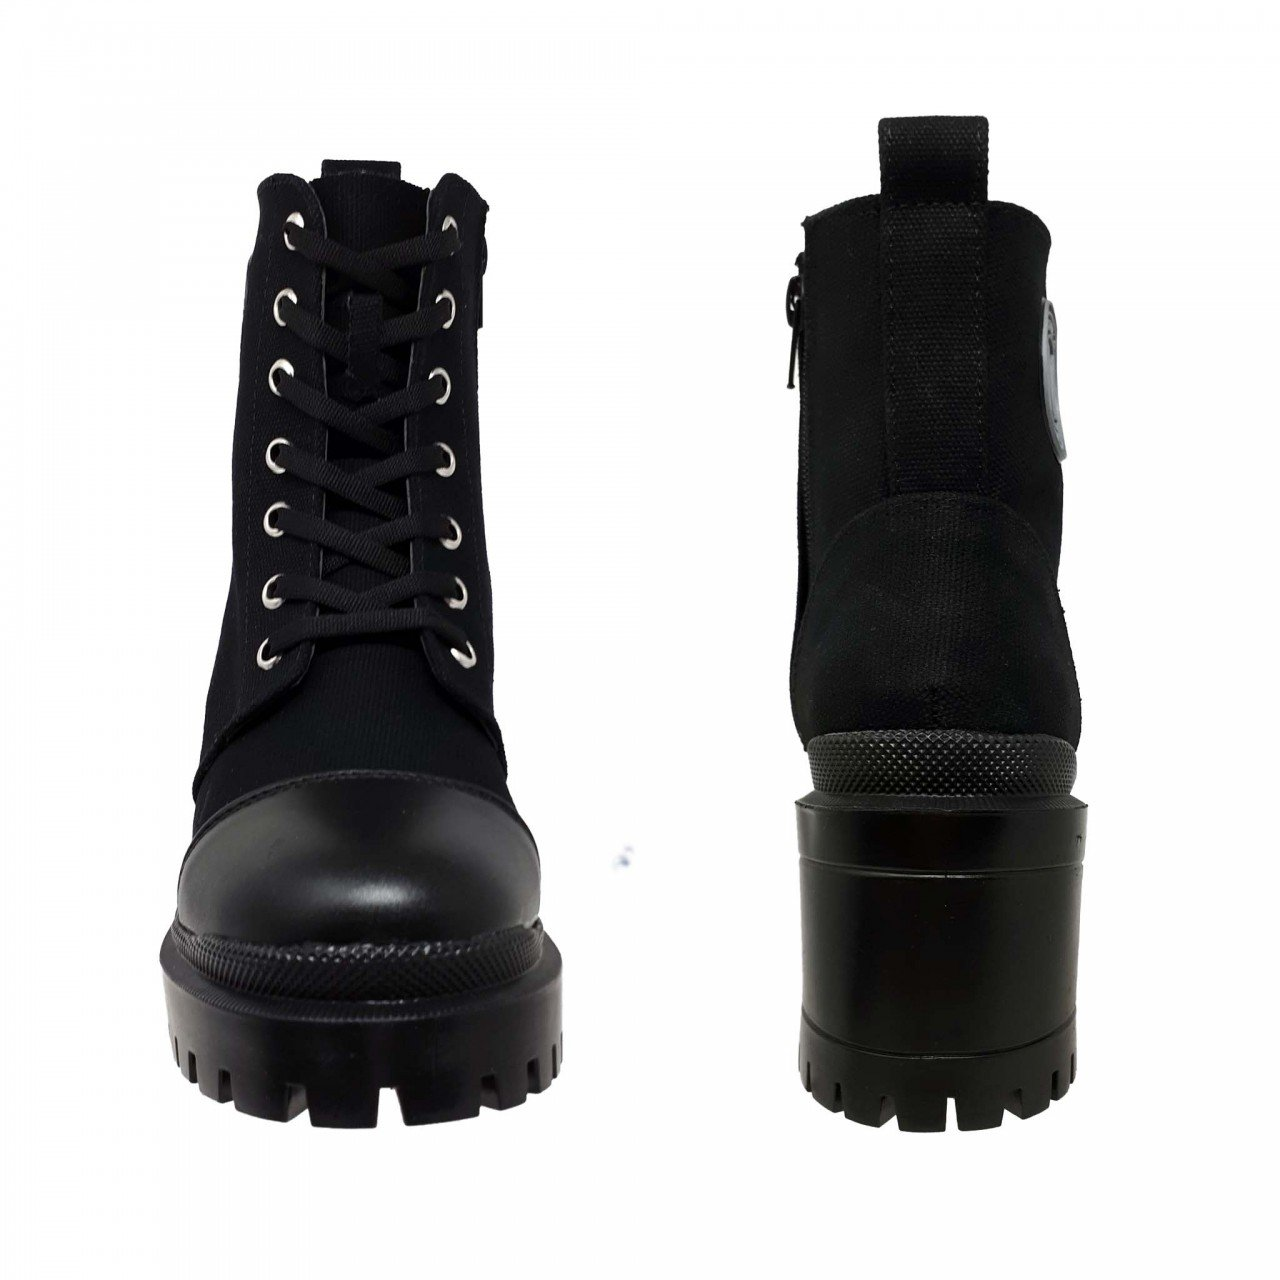 Botín negro lona textil para mujer M3123